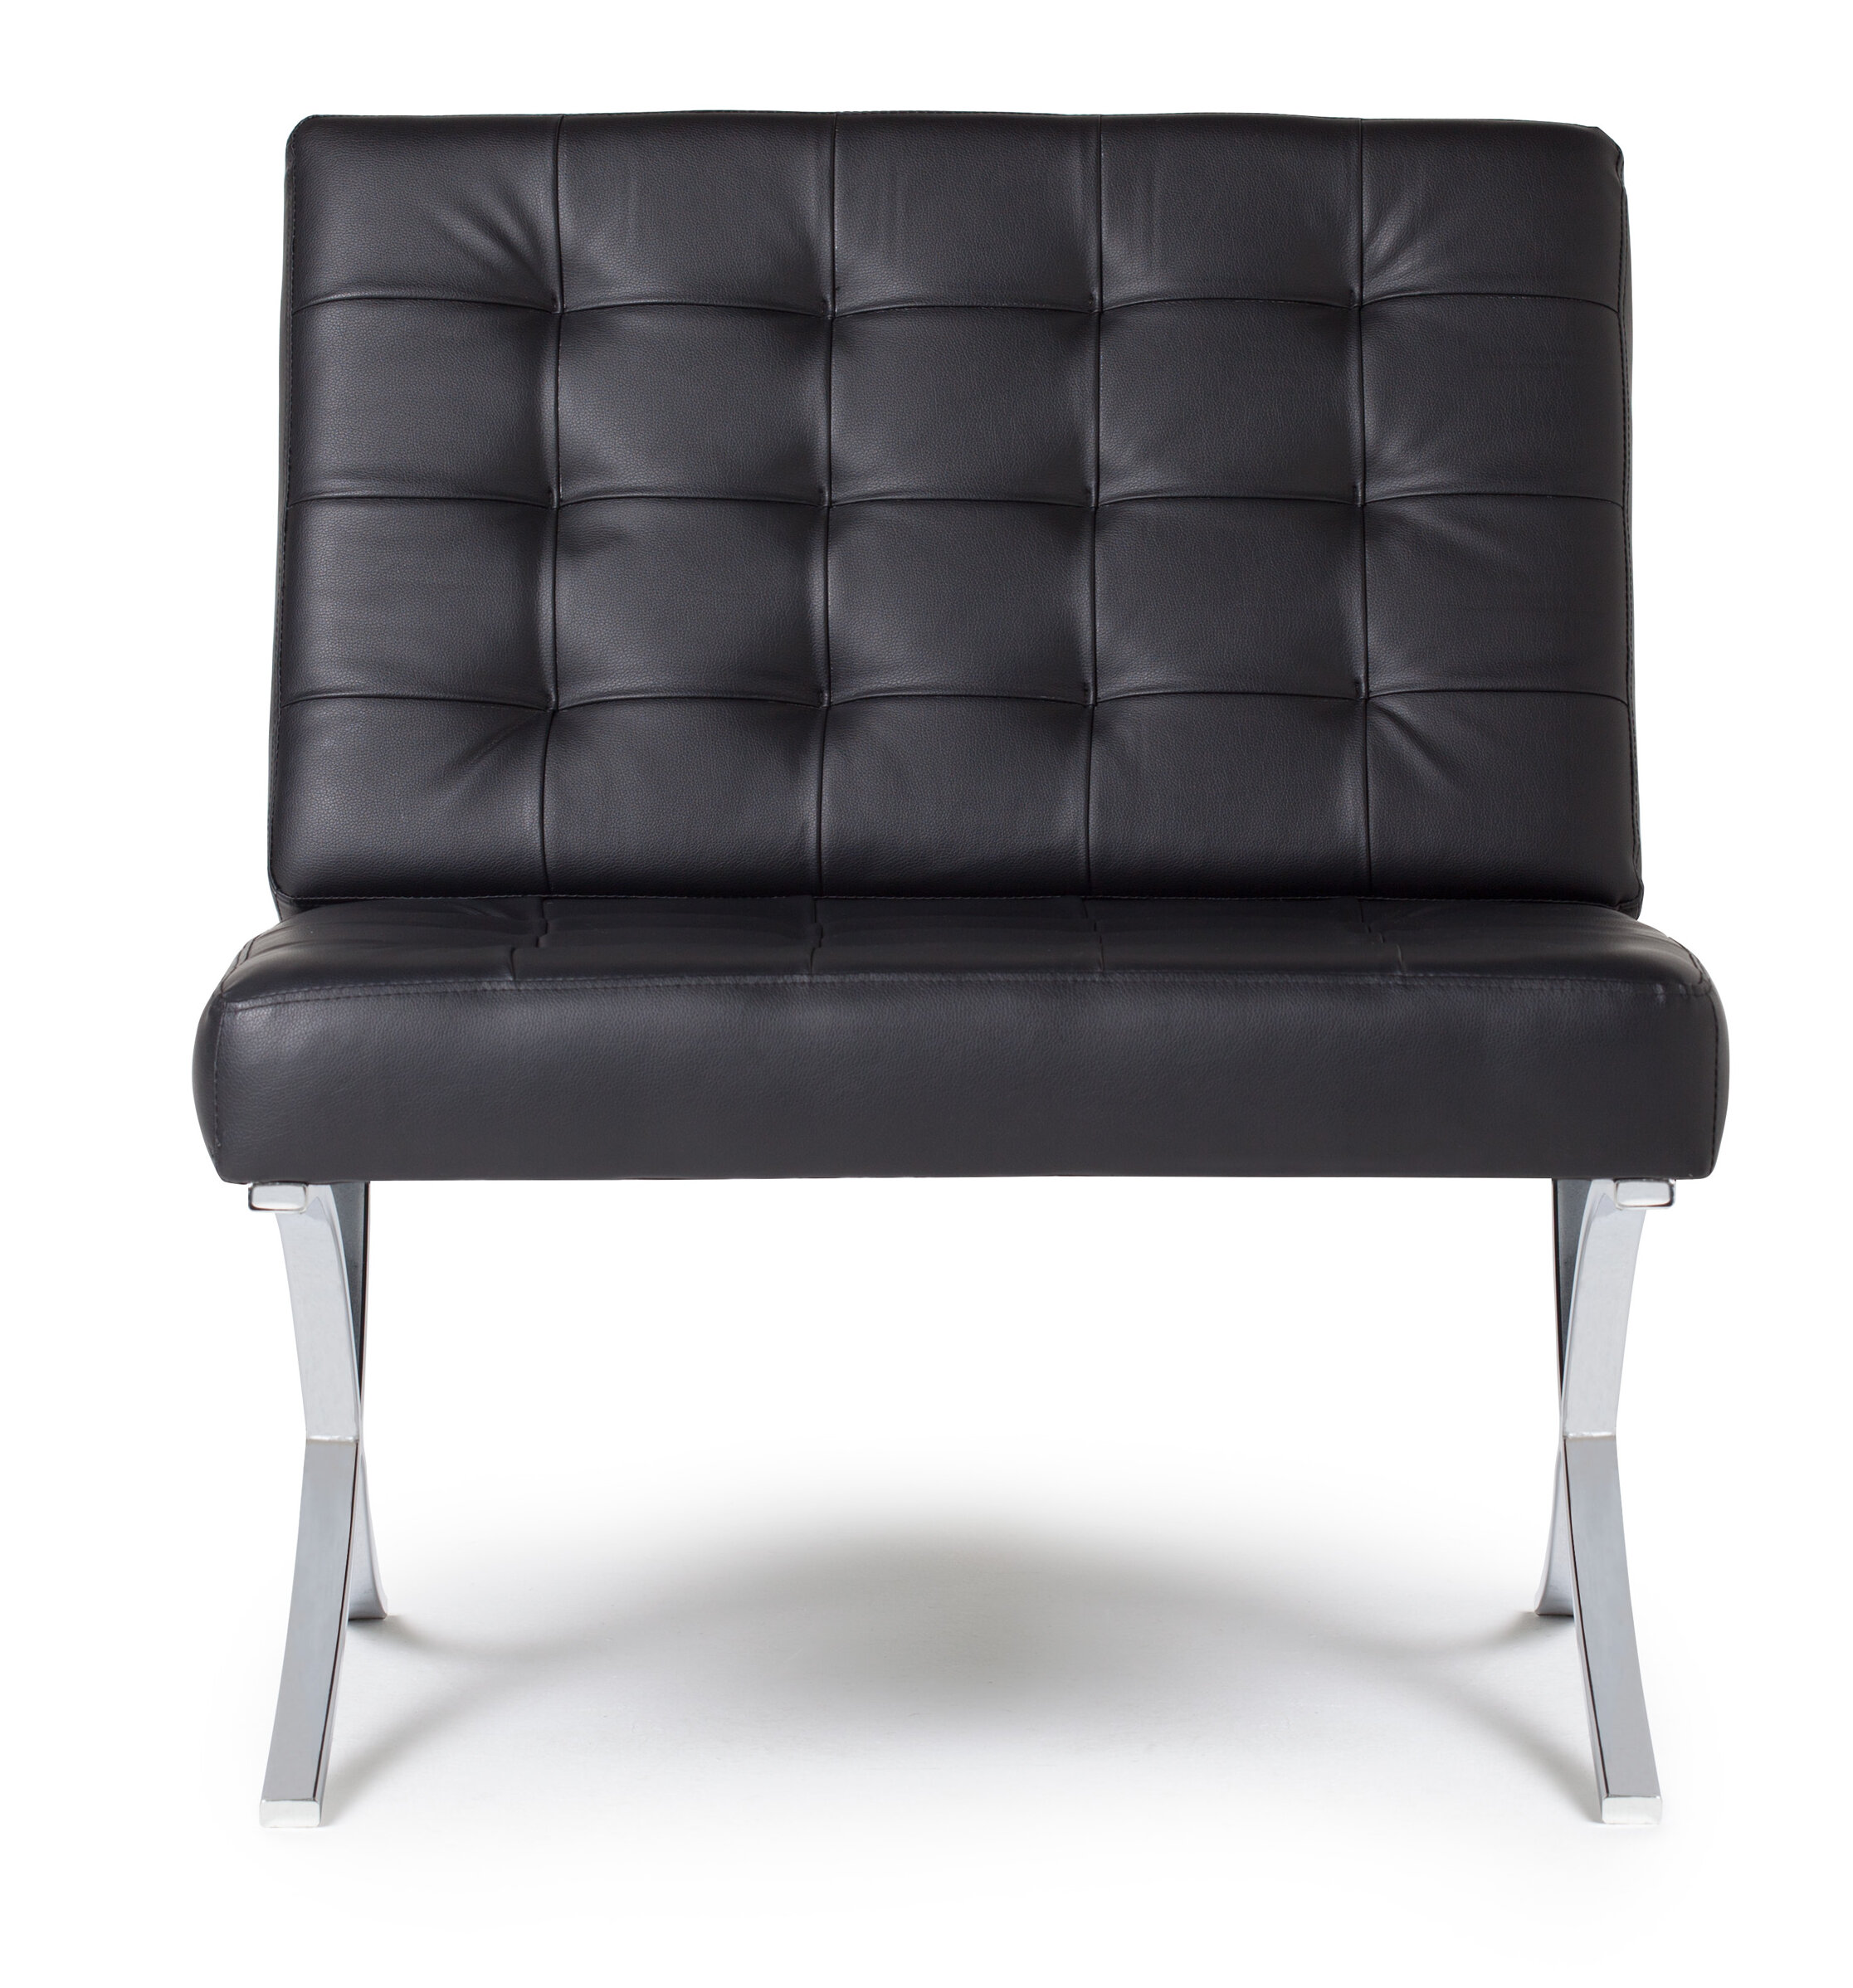 Merveilleux Studio Designs HOME Atrium Slipper Chair U0026 Reviews | Wayfair